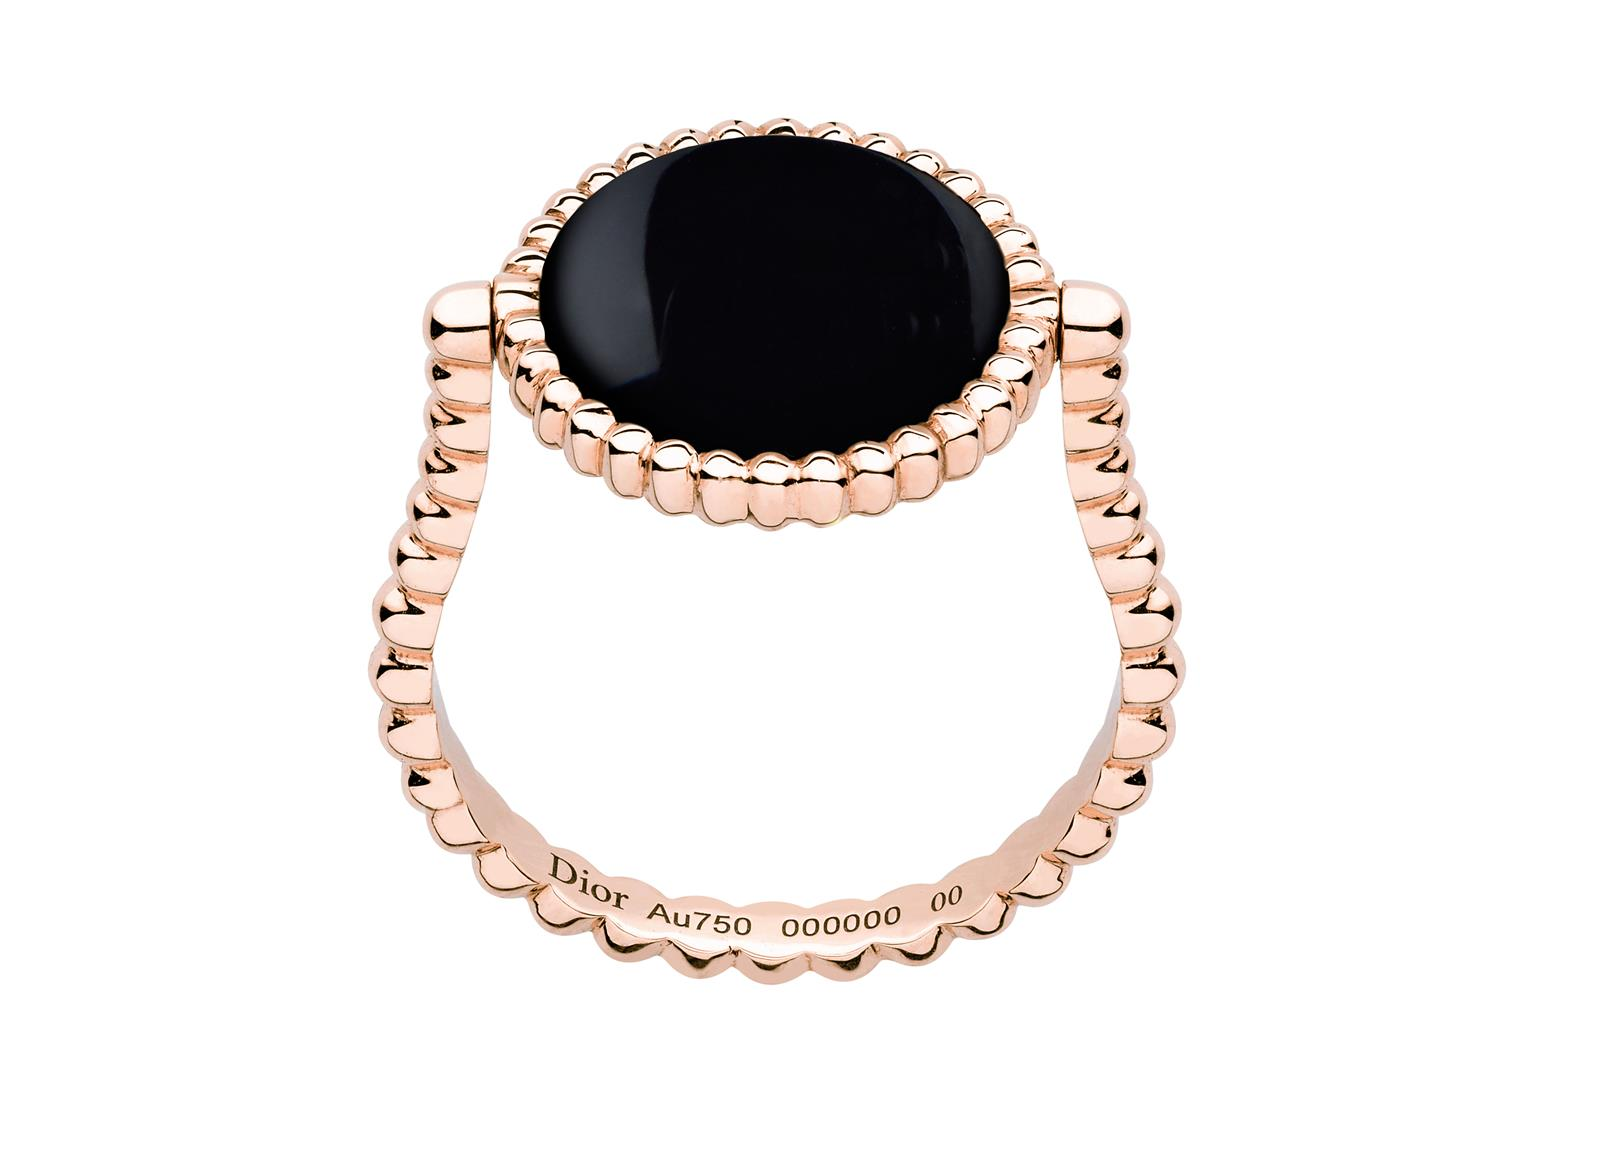 jewellery_JRDV95043_2 (Copy)